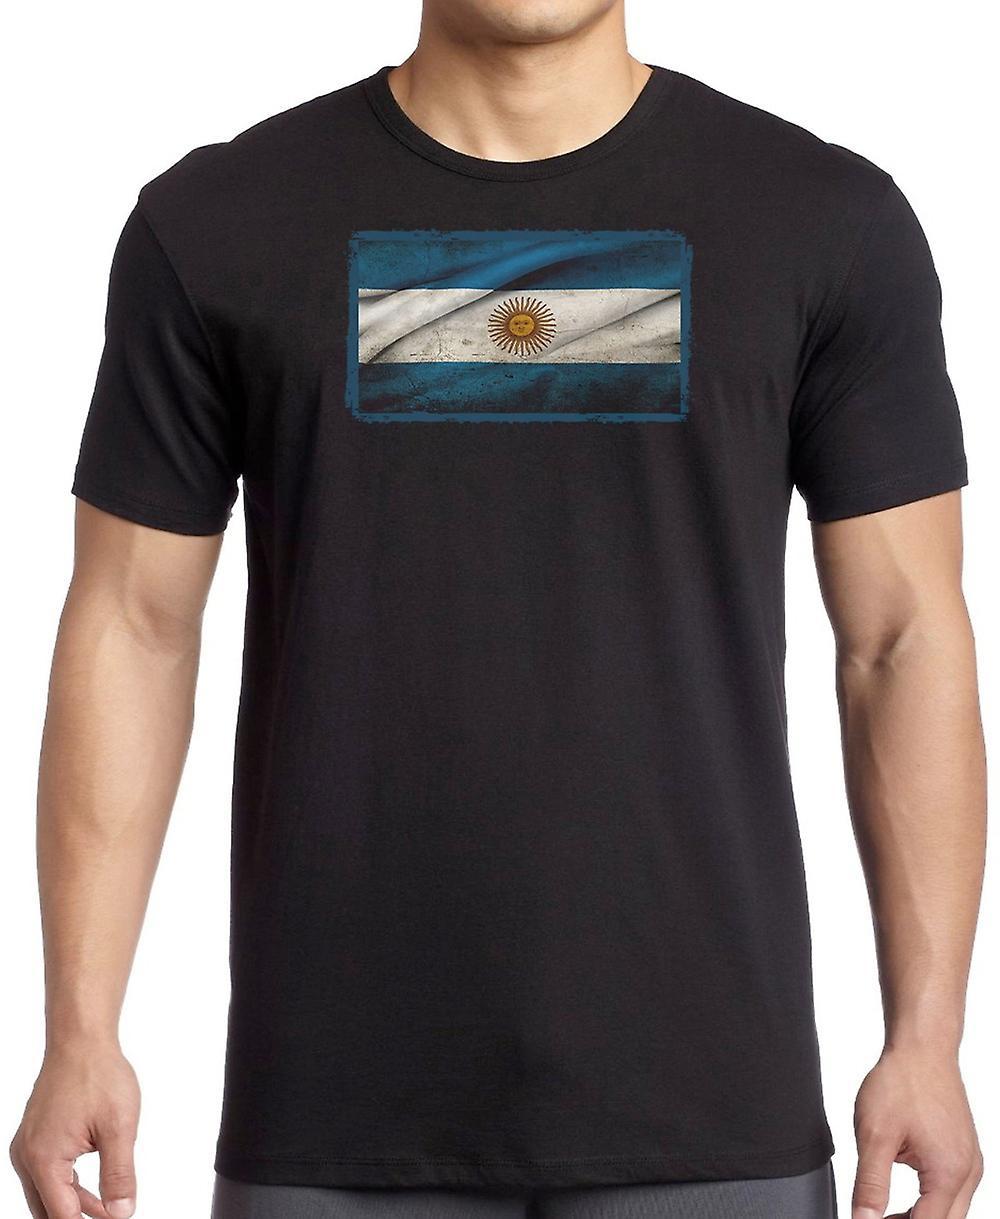 Argentinske Argentina Grunge flagg Kids T skjorte